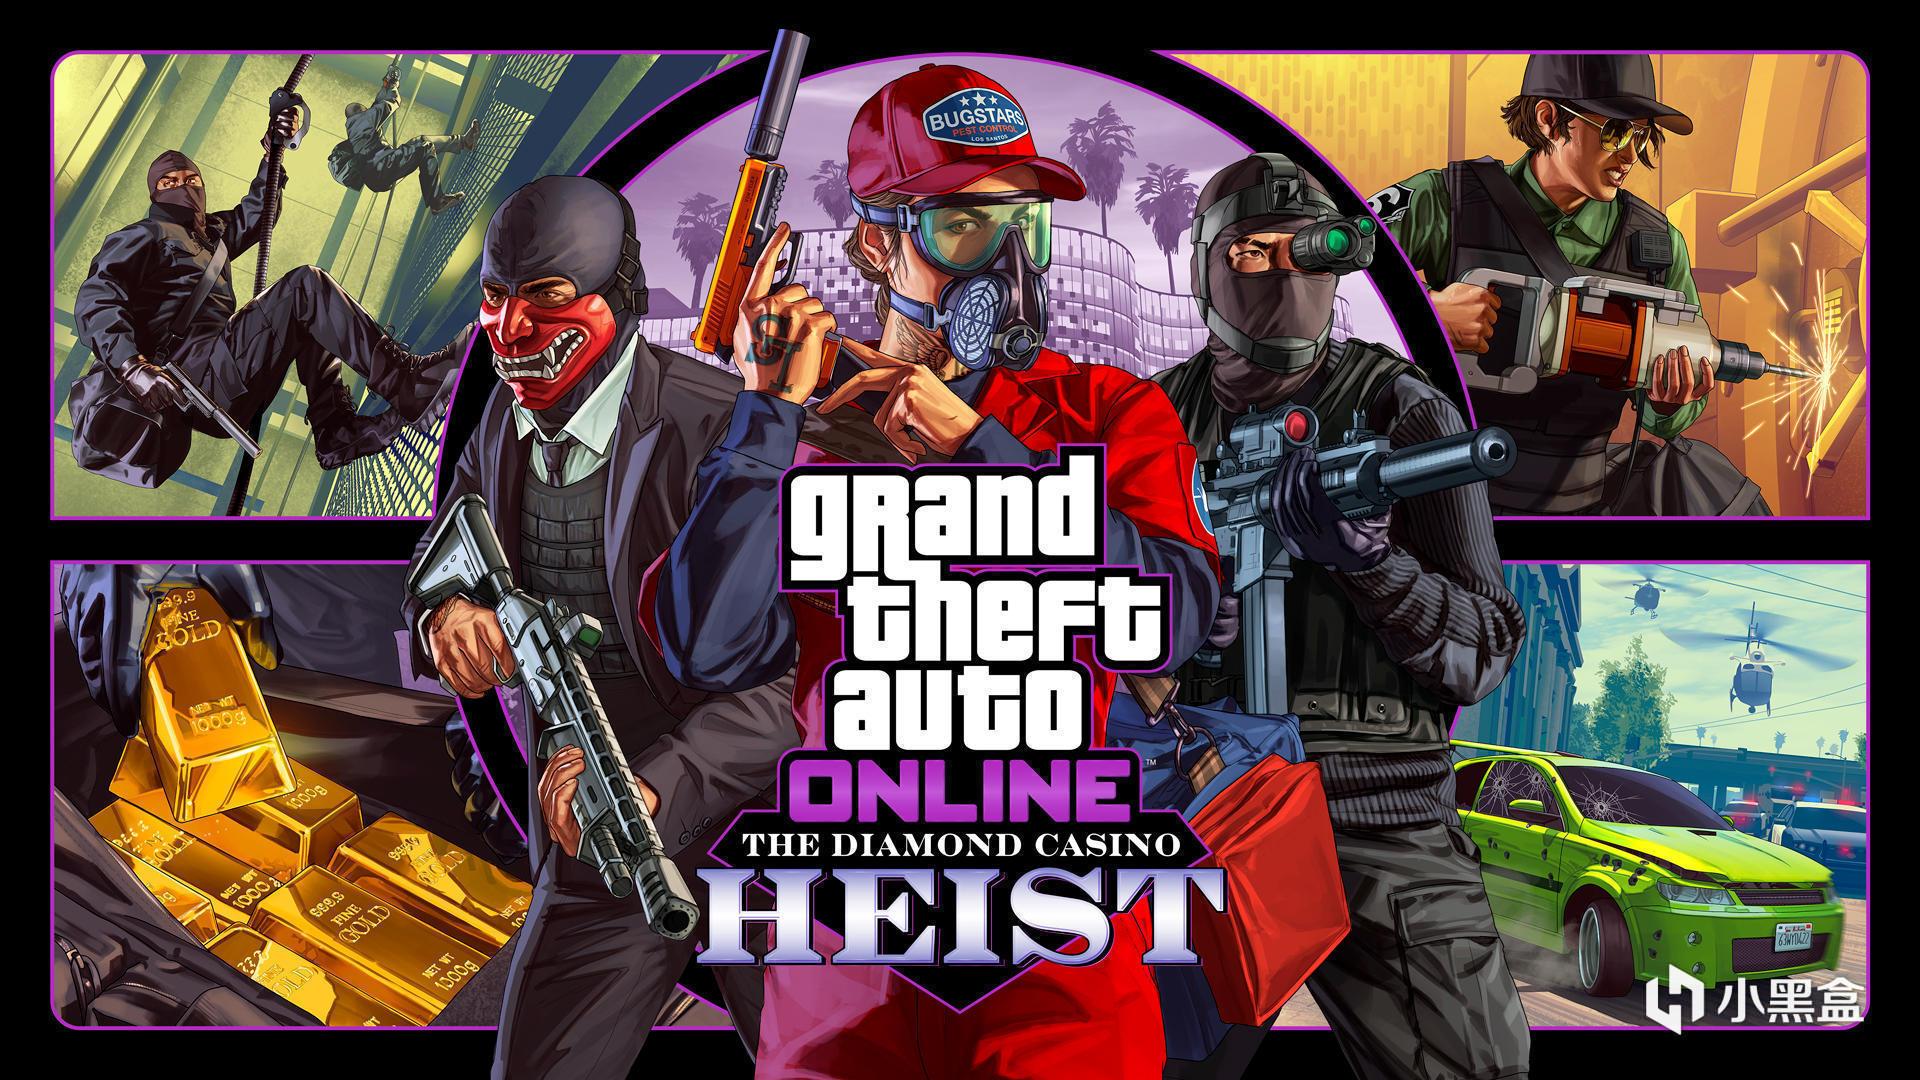 《GTA Online》误区之一:赚钱很难吗?插图18